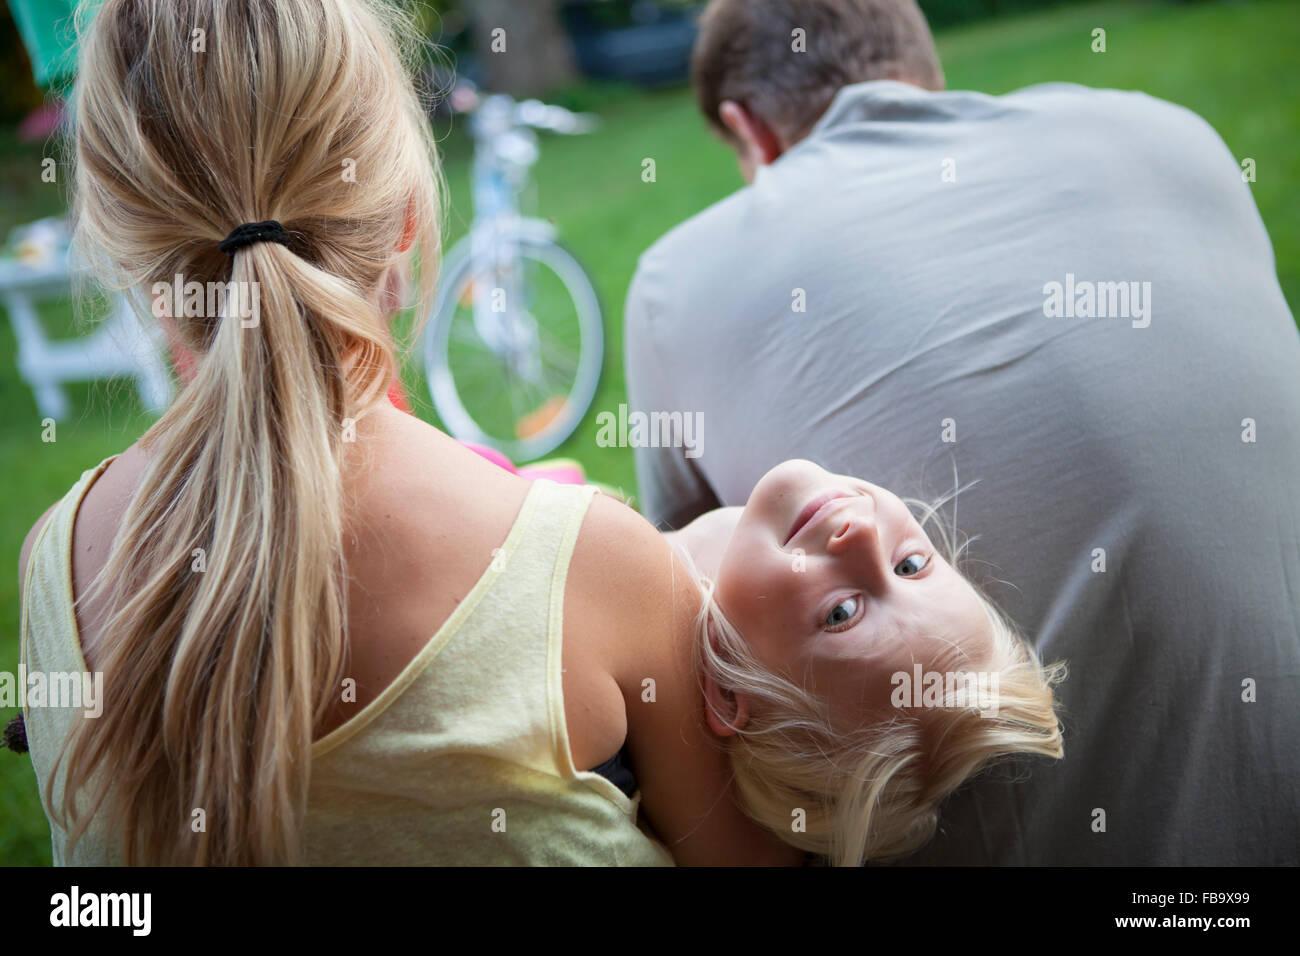 Sweden, Narke, Filipshyttan, Portrait of girls (6-7, 14-15) with father Stock Photo